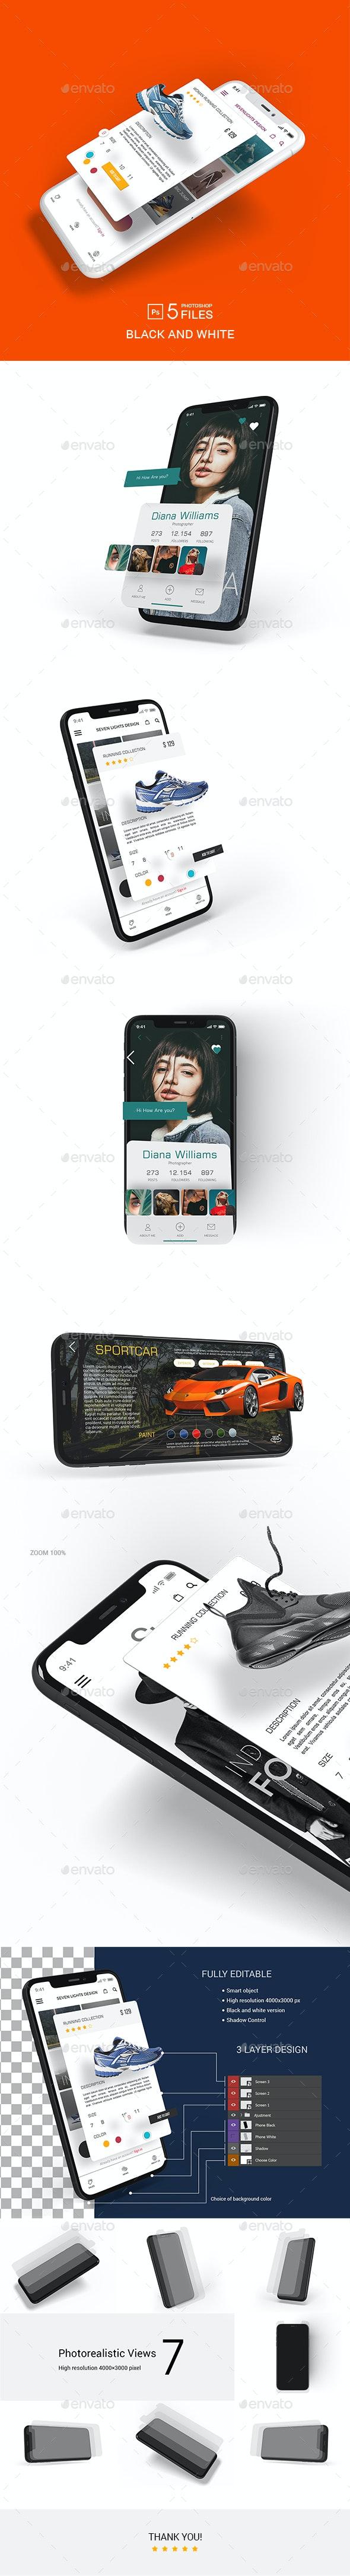 Phone X Multilayer Mockup - Mobile Displays